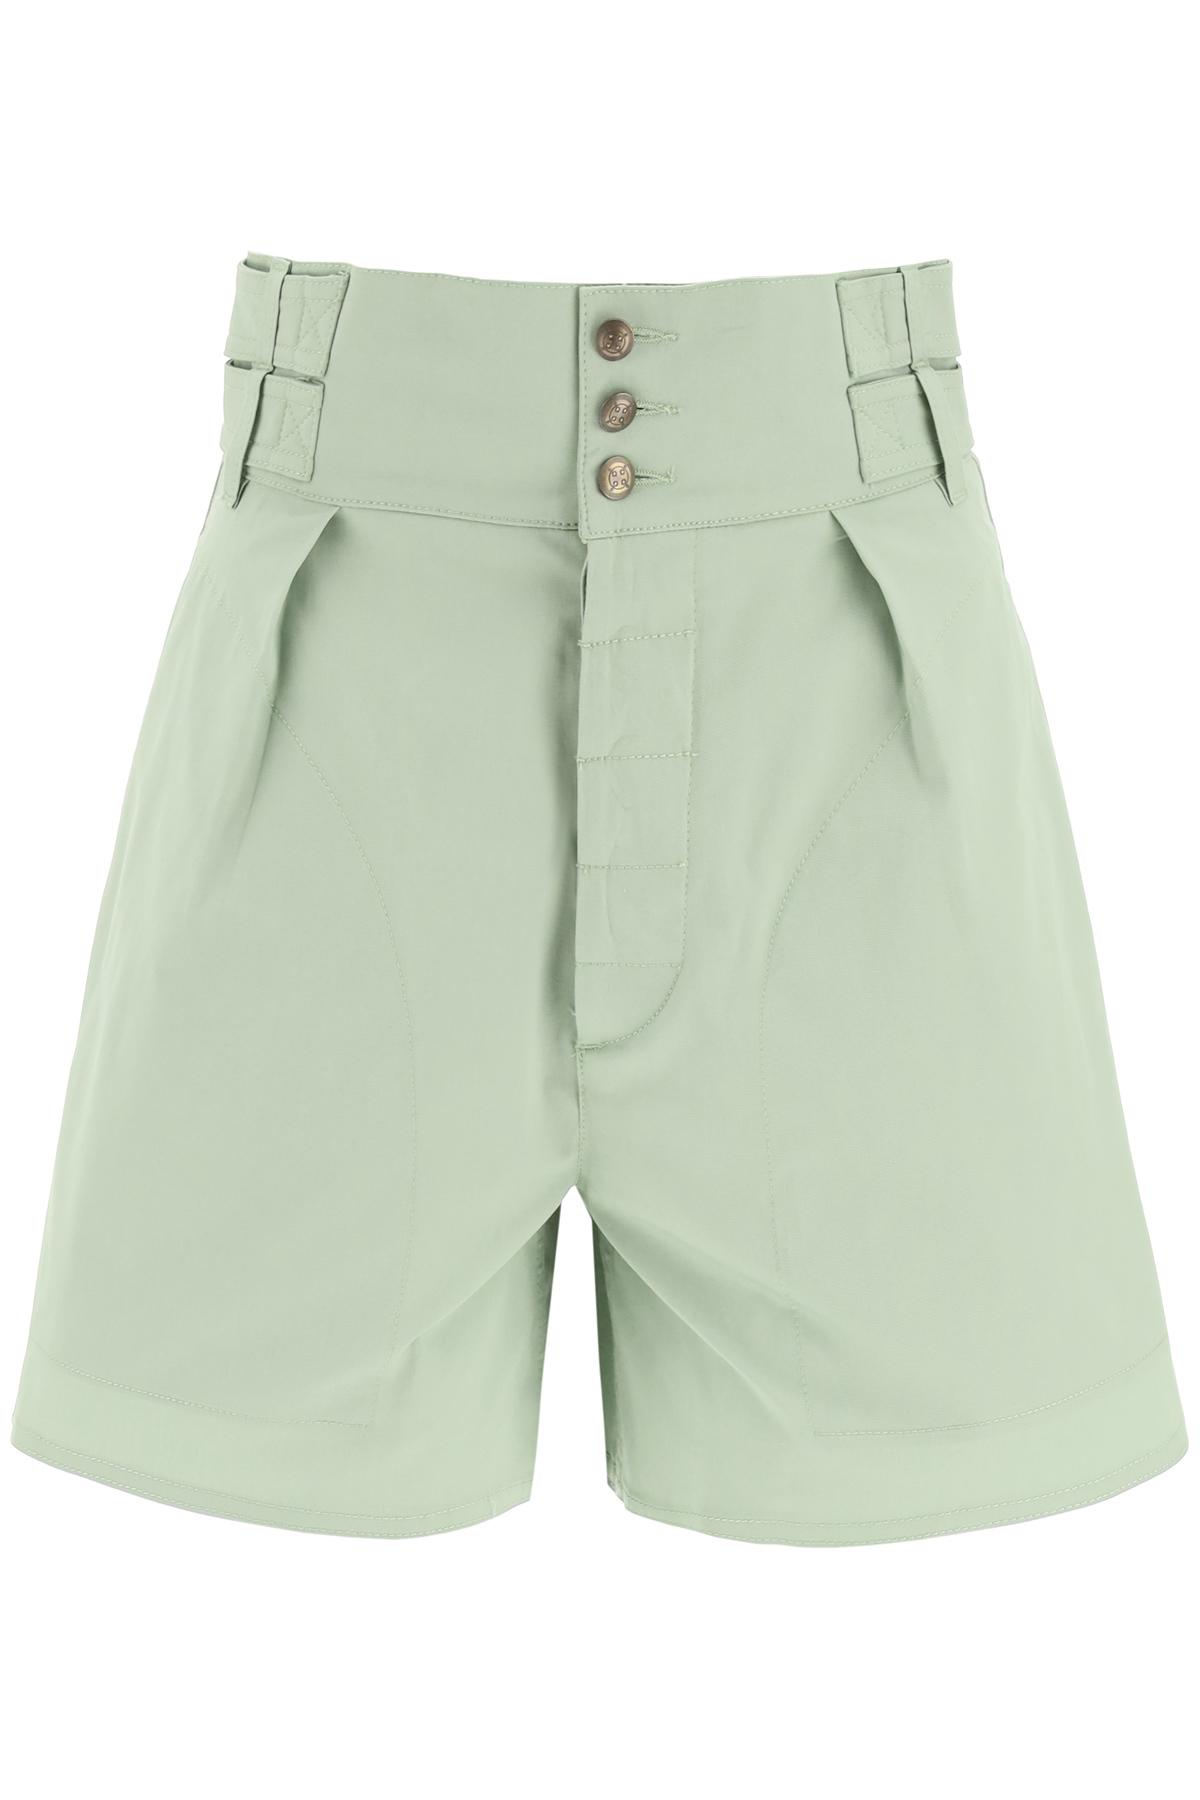 Etro shorts in cotone